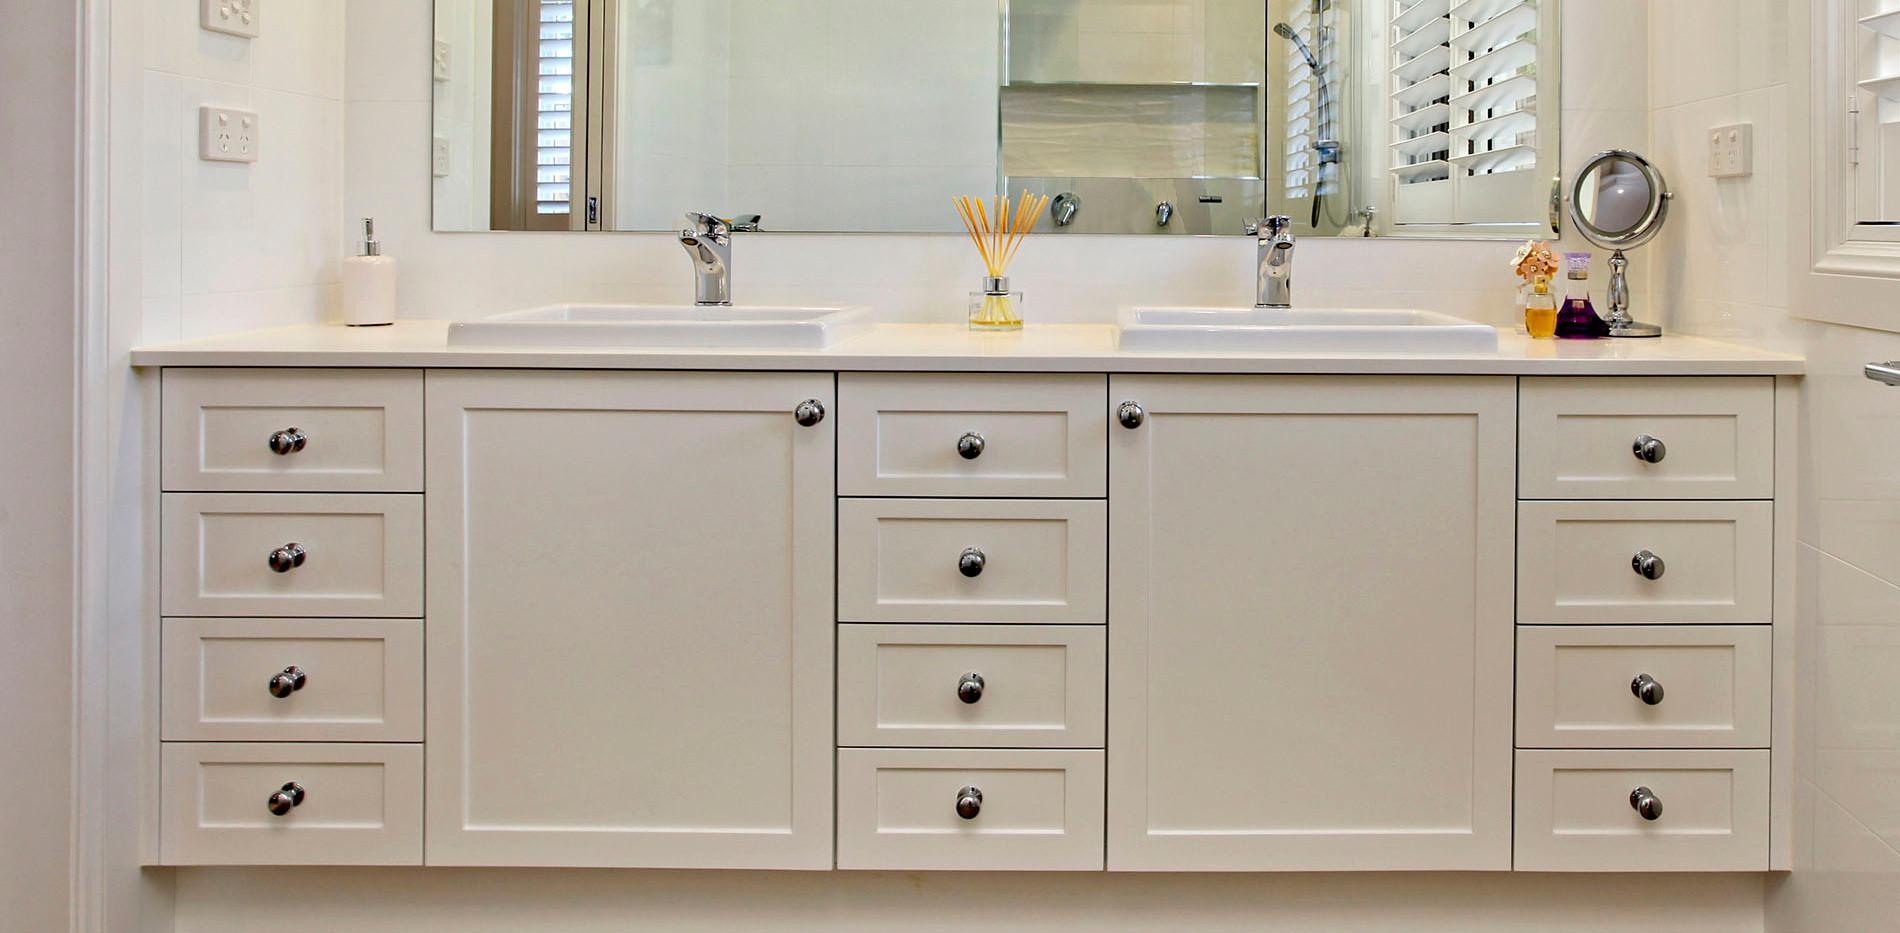 Hawkesbury bathrooms and Kitchens (41)